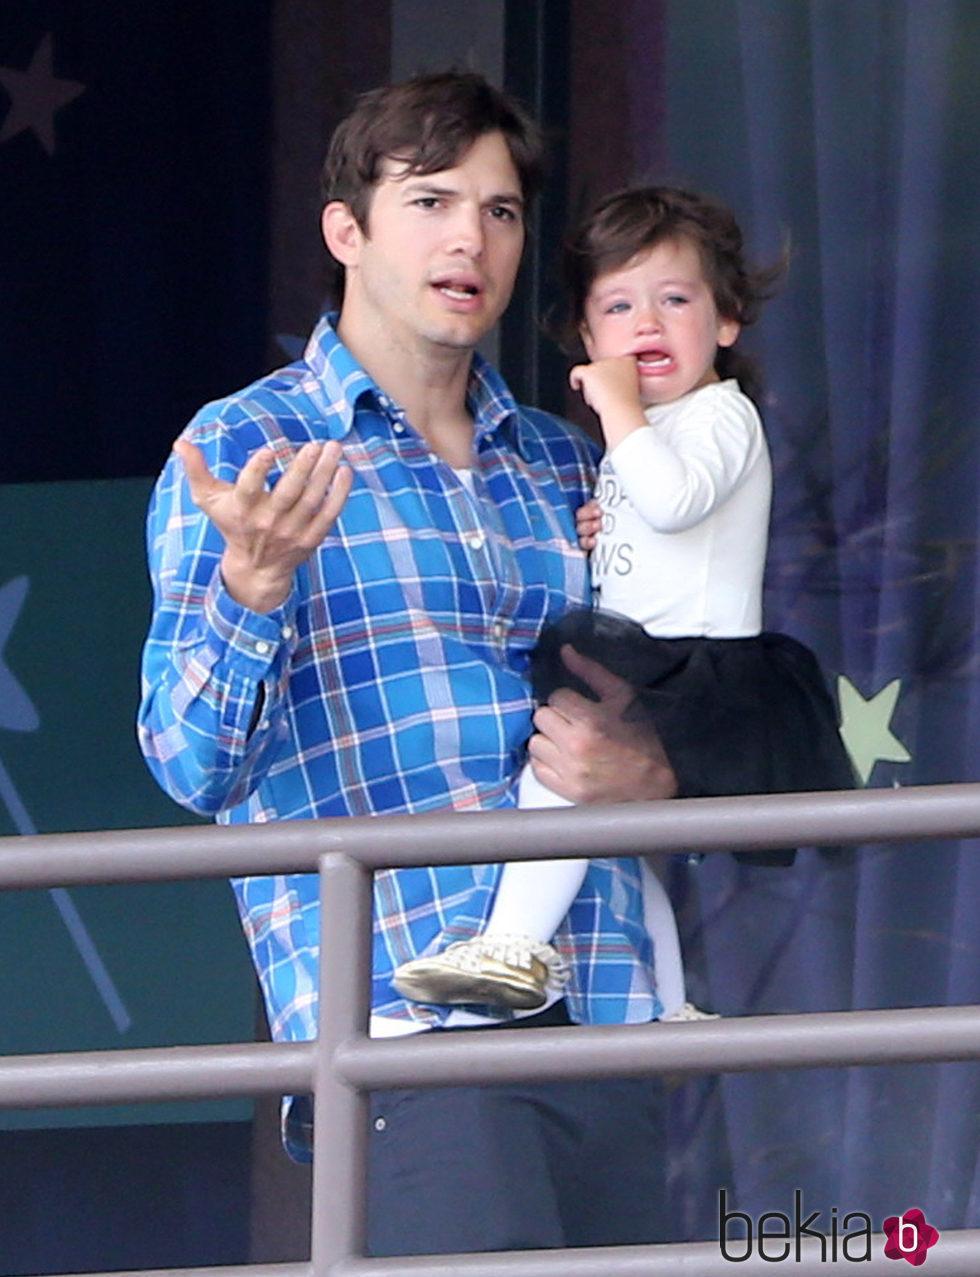 Asthon Kutcher junto a su hija desconsolada Wyatt